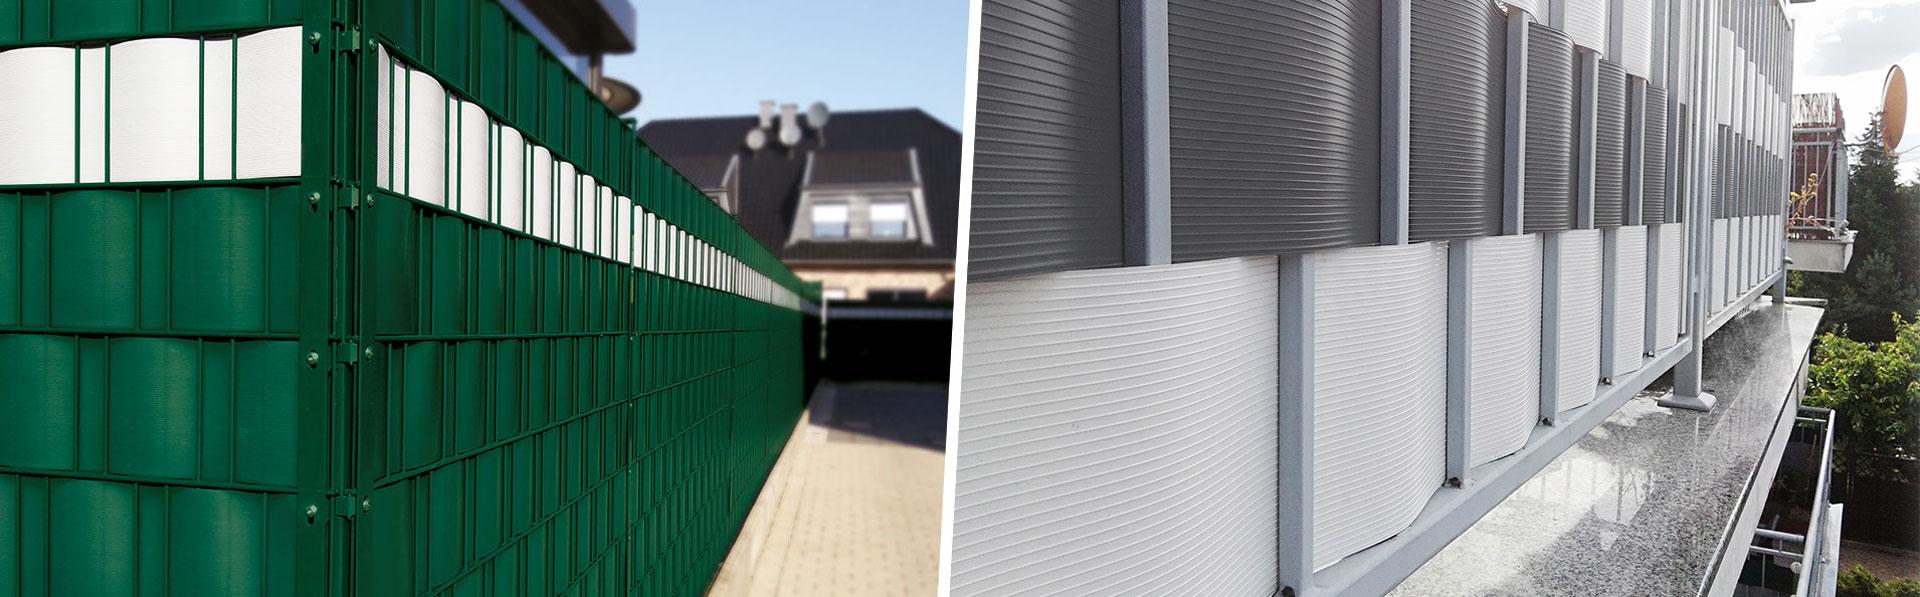 Fence Strip - Thermoplast